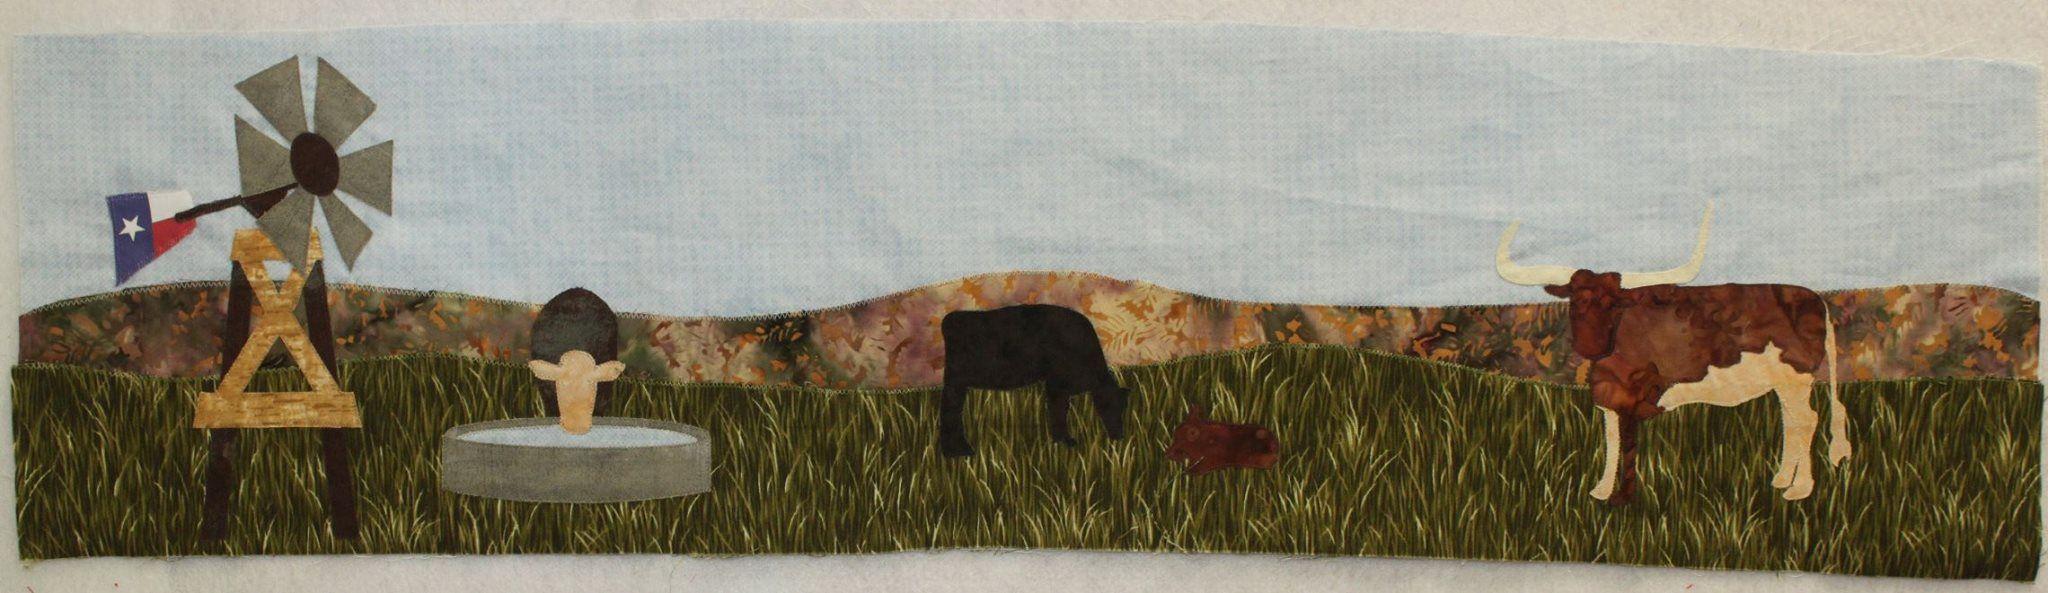 Sew Let's Quilt it, Dallas | row by row | Pinterest | Dallas : dallas quilt shops - Adamdwight.com